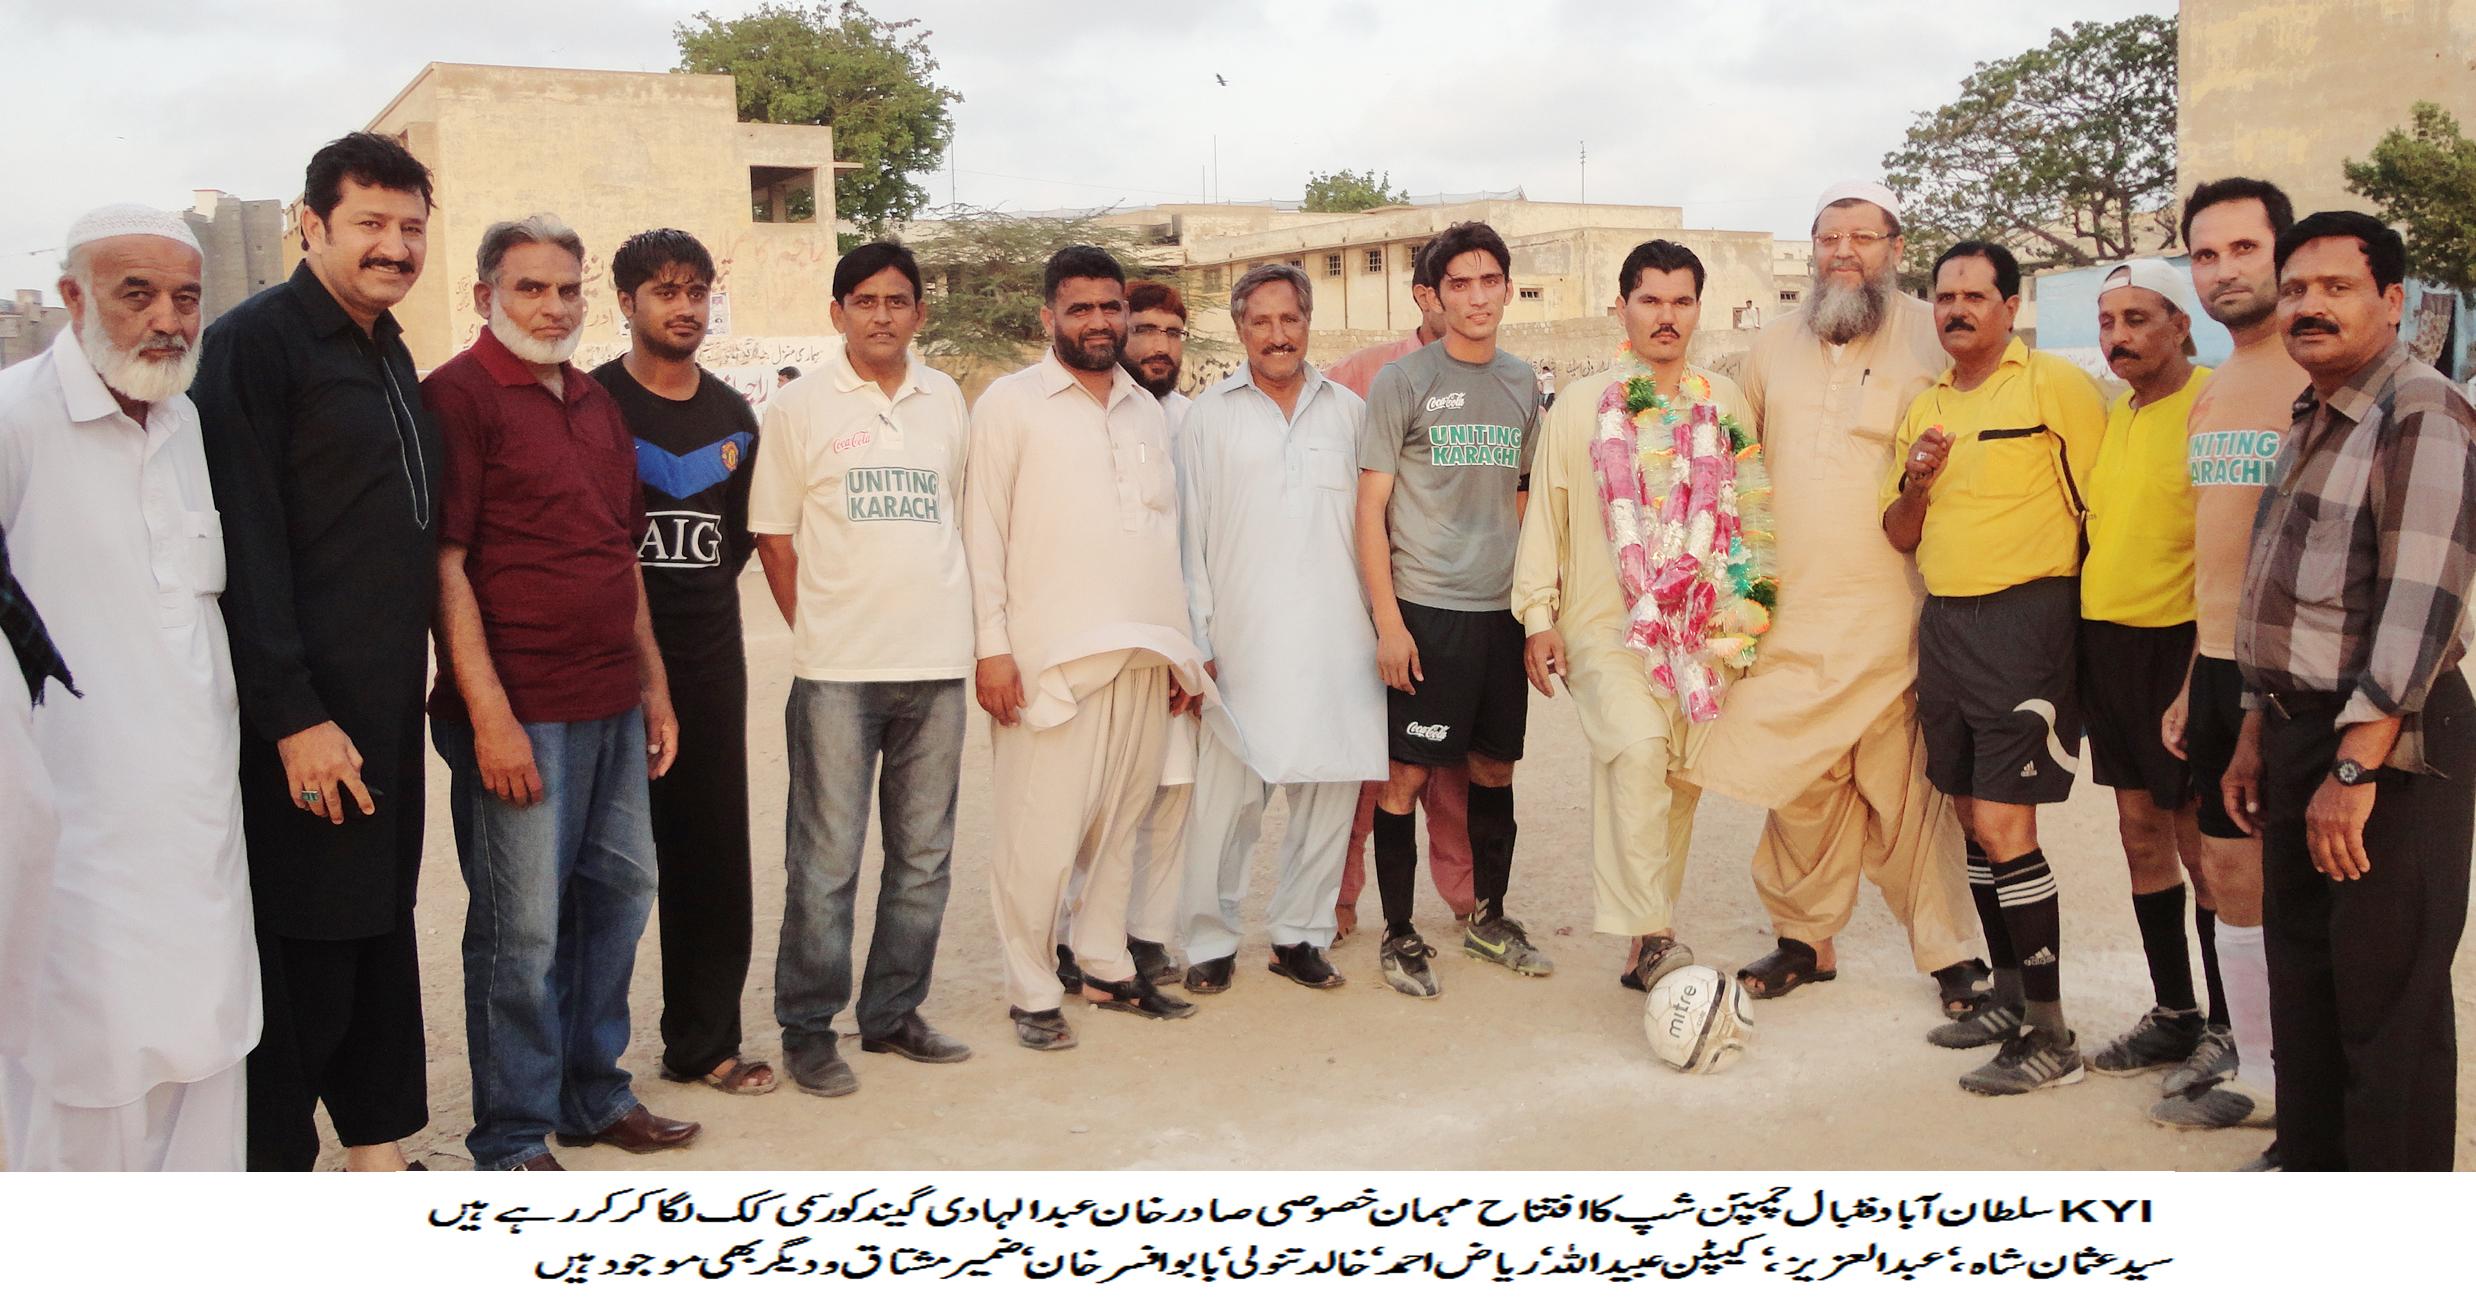 COCA COLA SULTANABAD FOOTBALL CHAMPIONSHIP kicks off in Karachi